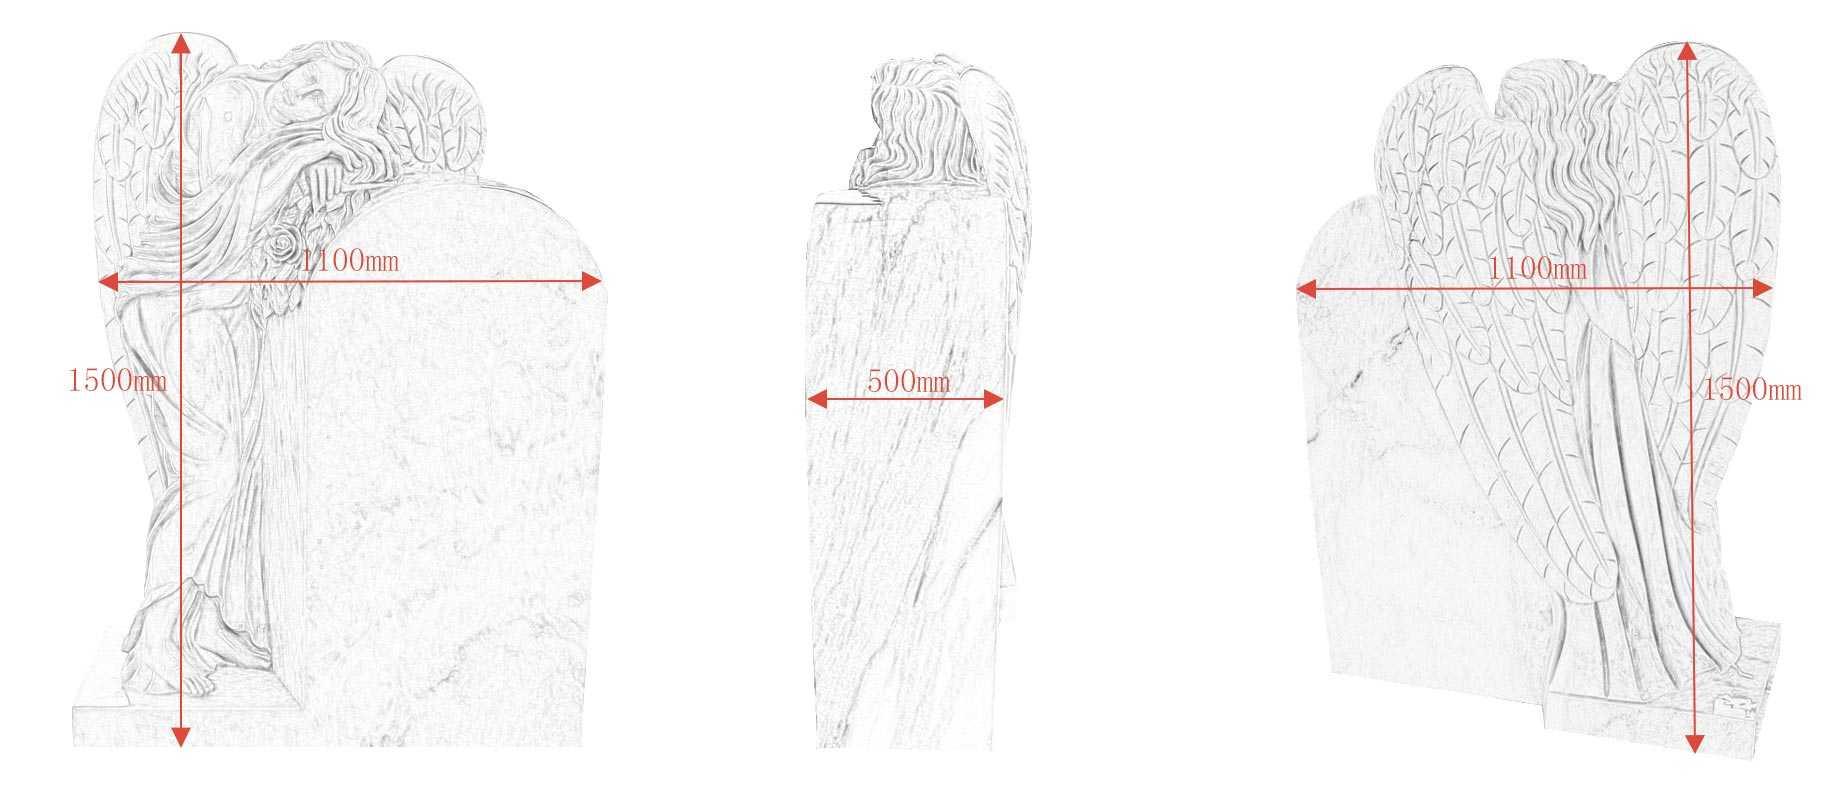 The polished granite headstone drawings